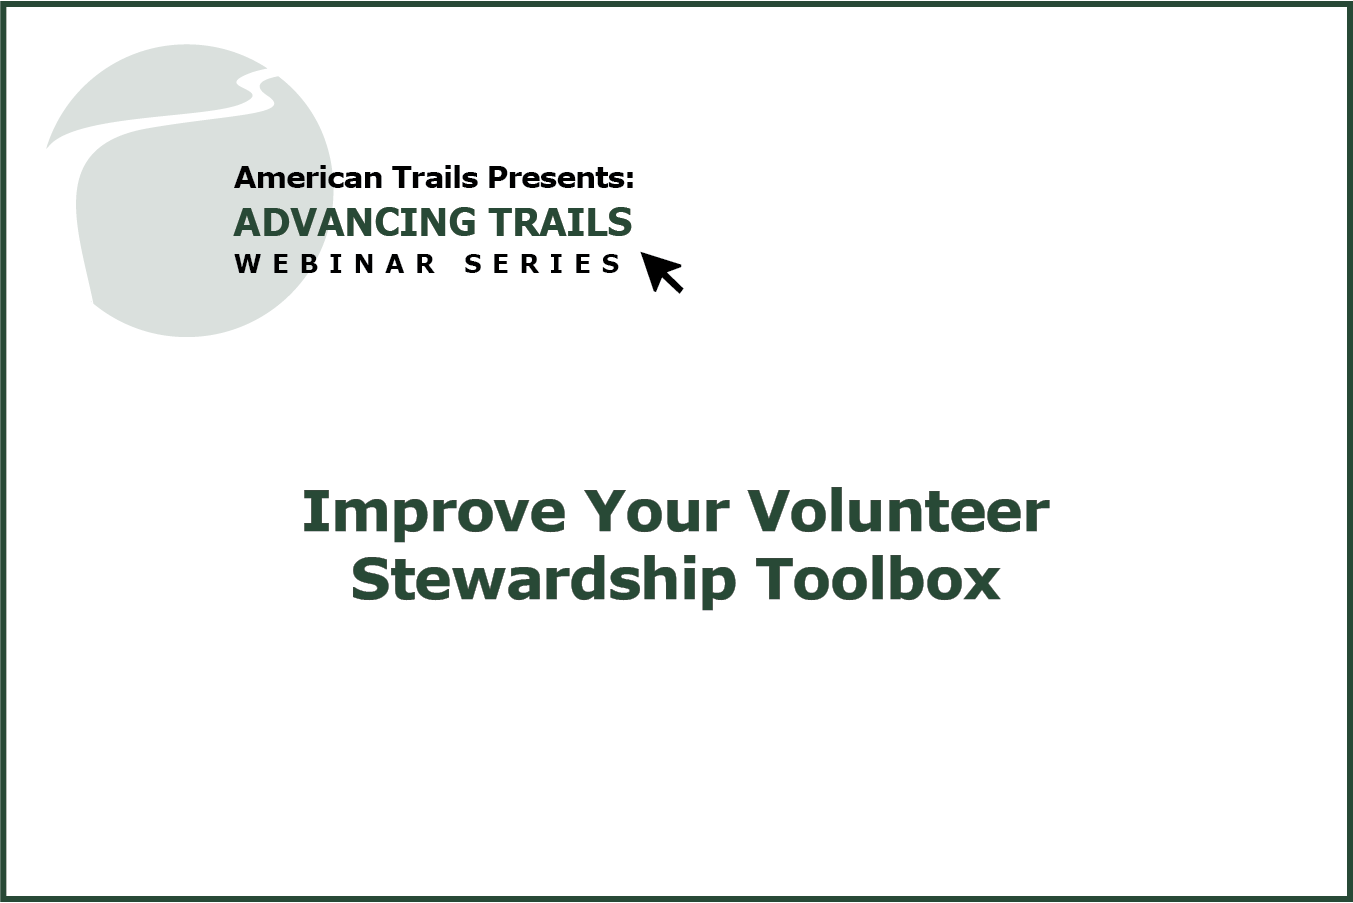 Improve Your Volunteer Stewardship Toolbox